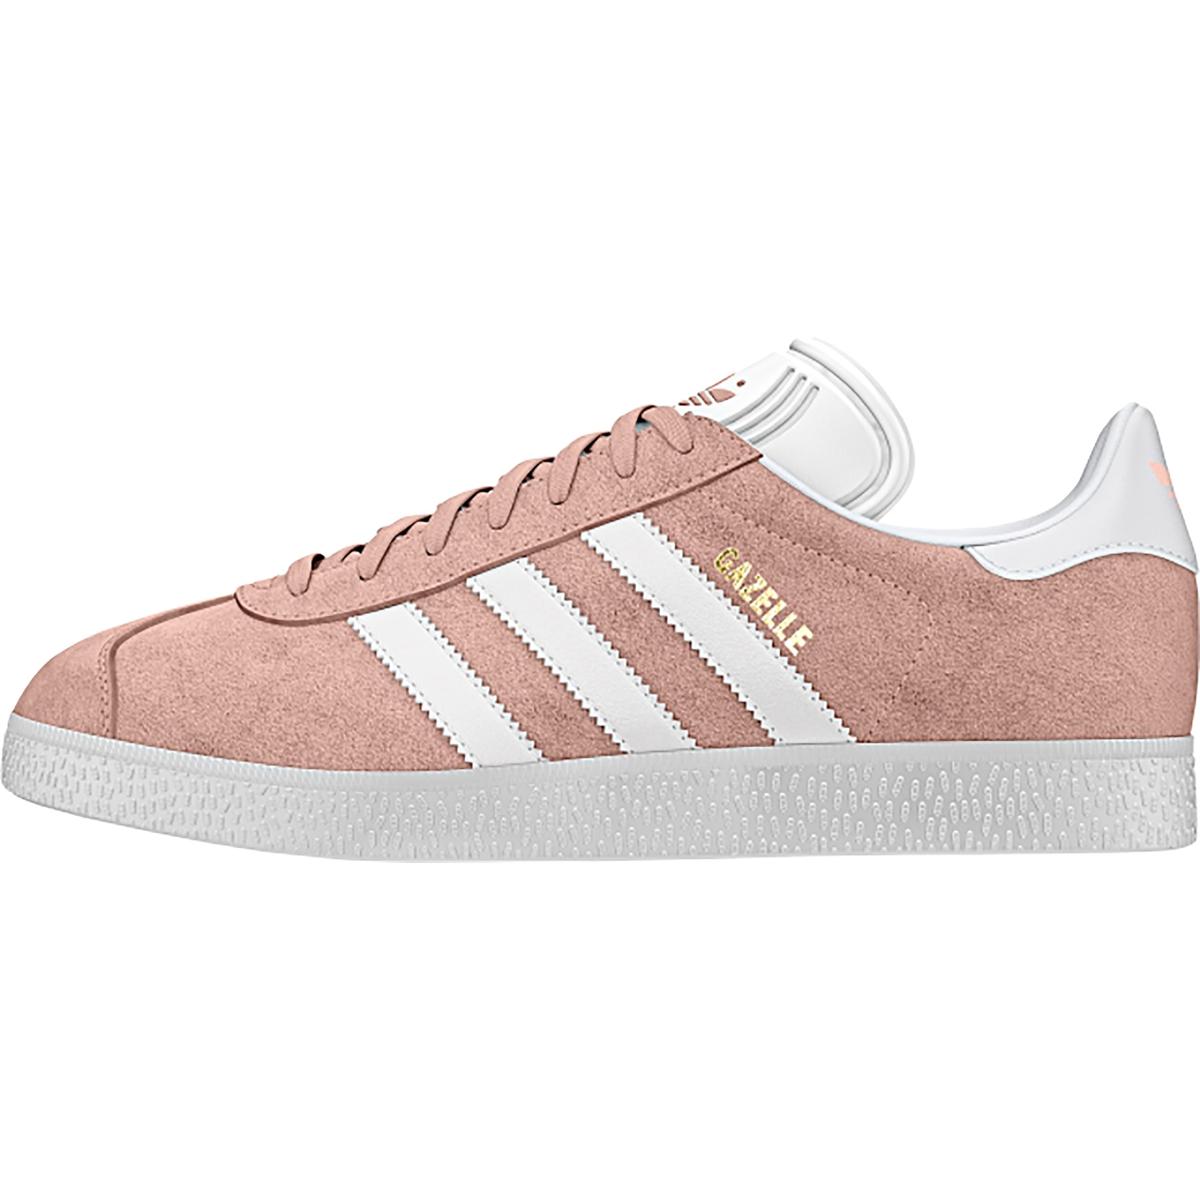 Adidas Unisex Adults' Gazelle Gymnastics Shoes, Vapour Pink/White/Gold Metallic), 6.5 UK 40 EU